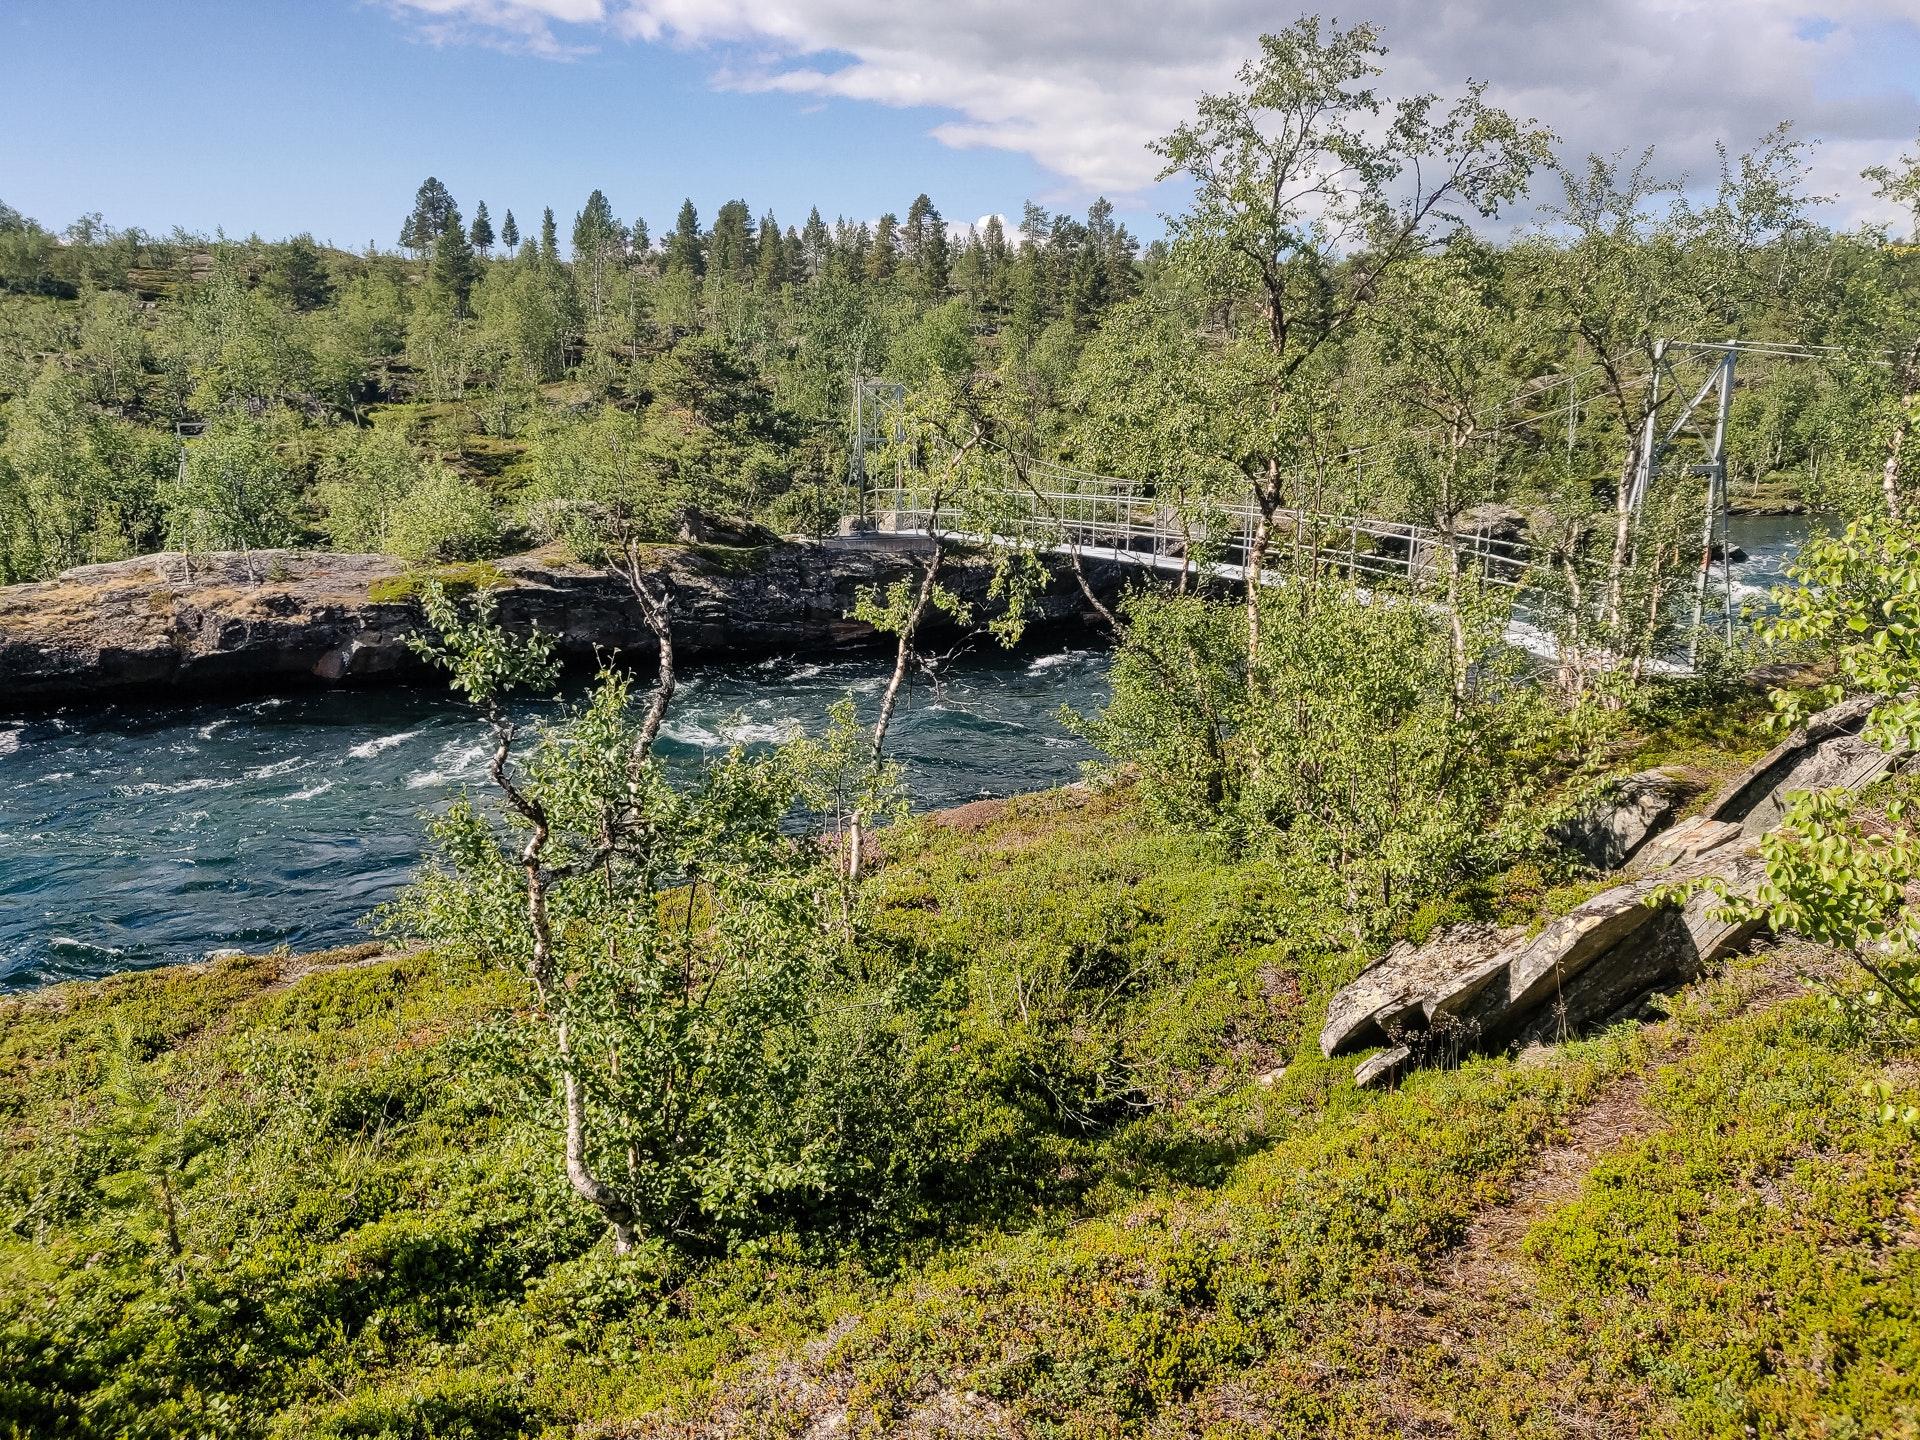 Luspevárátj Bridge